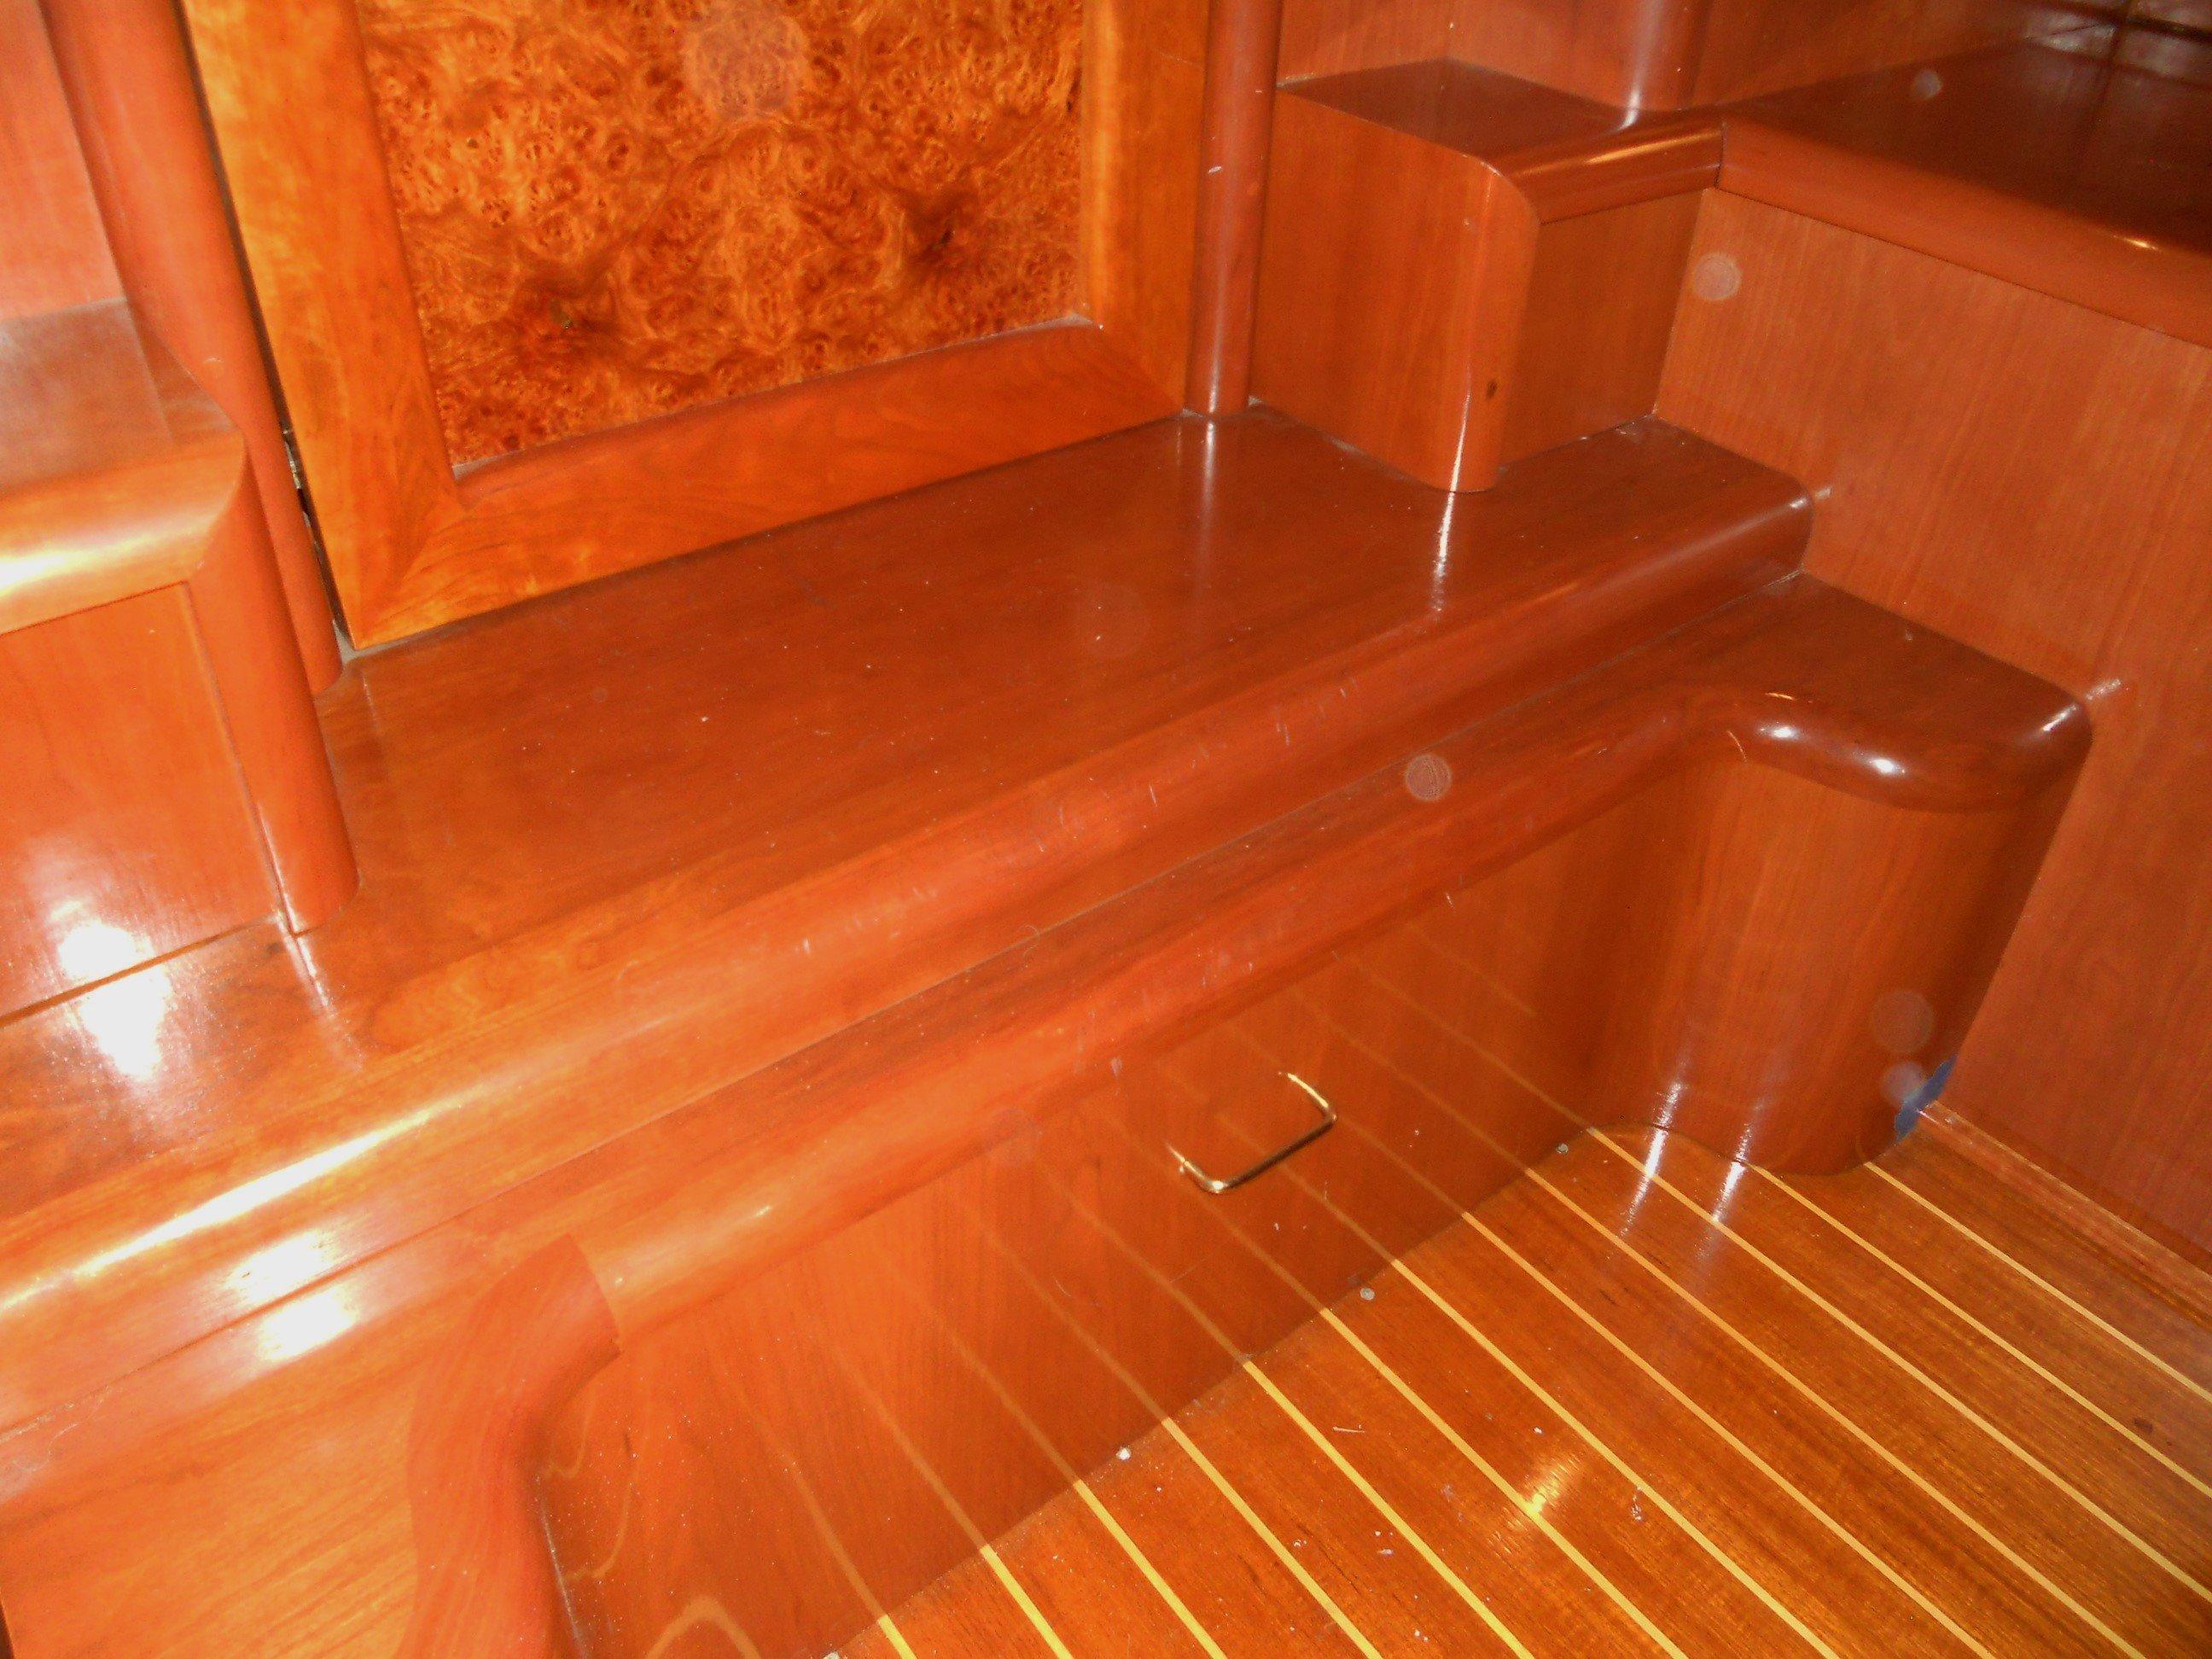 Unbelievable wood detail